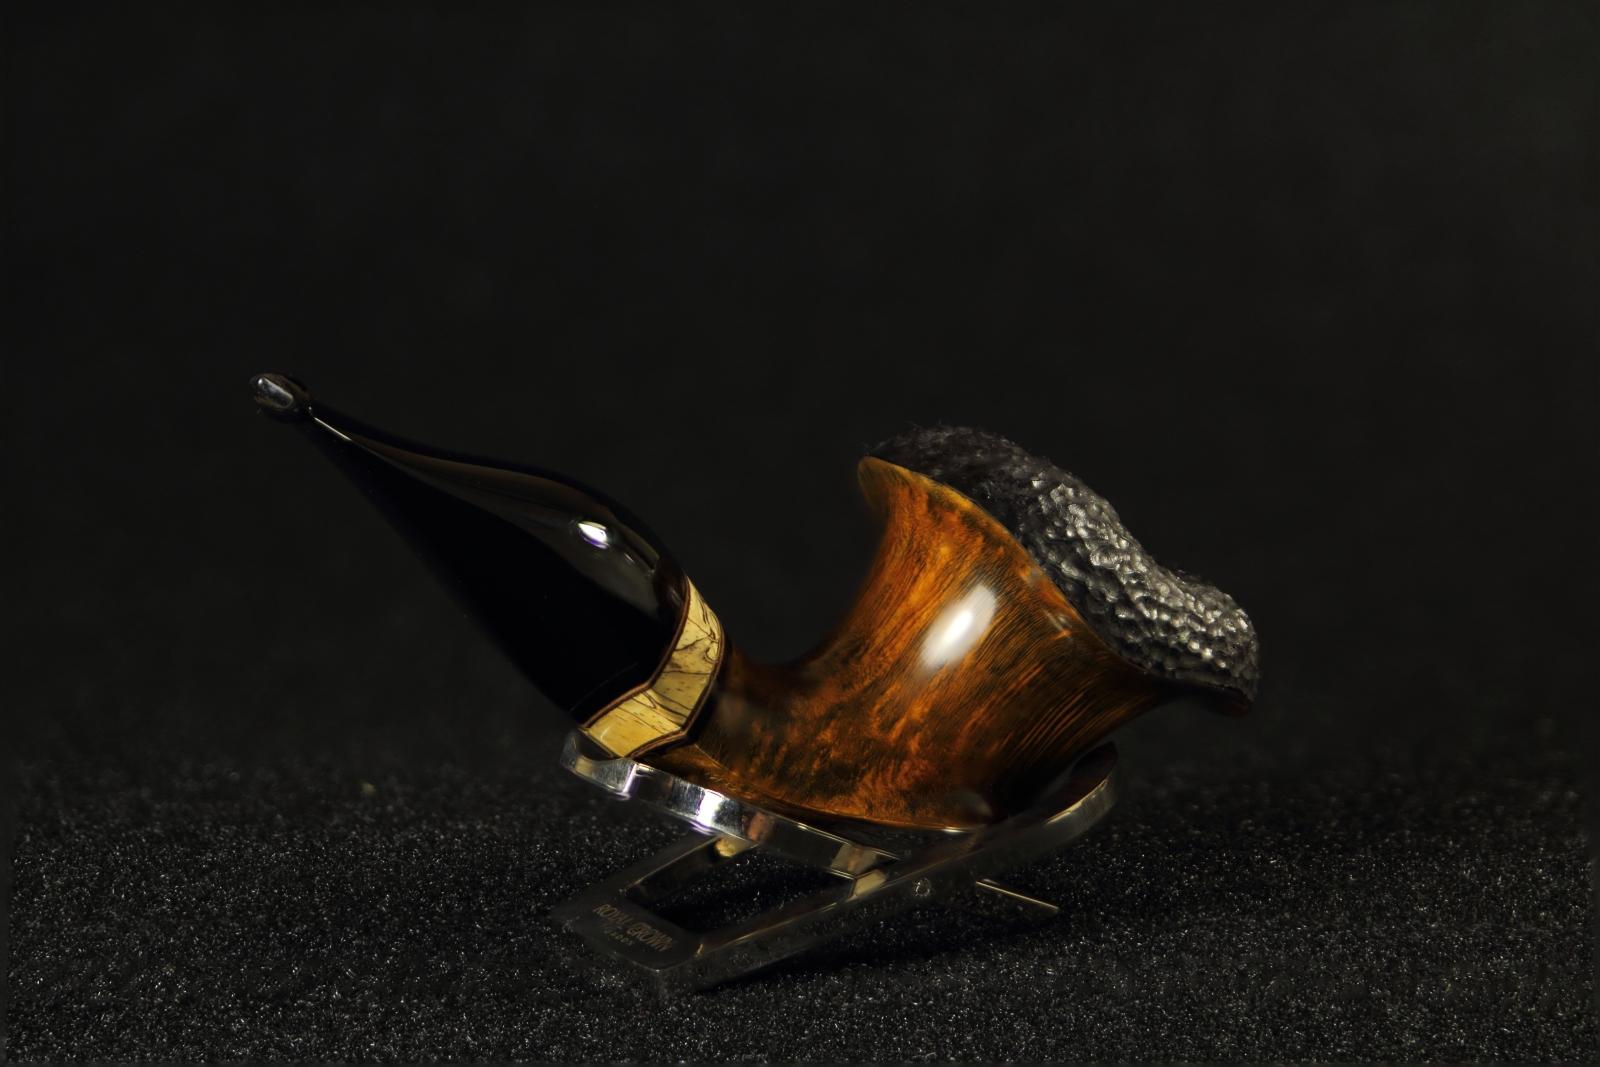 Pca14-004